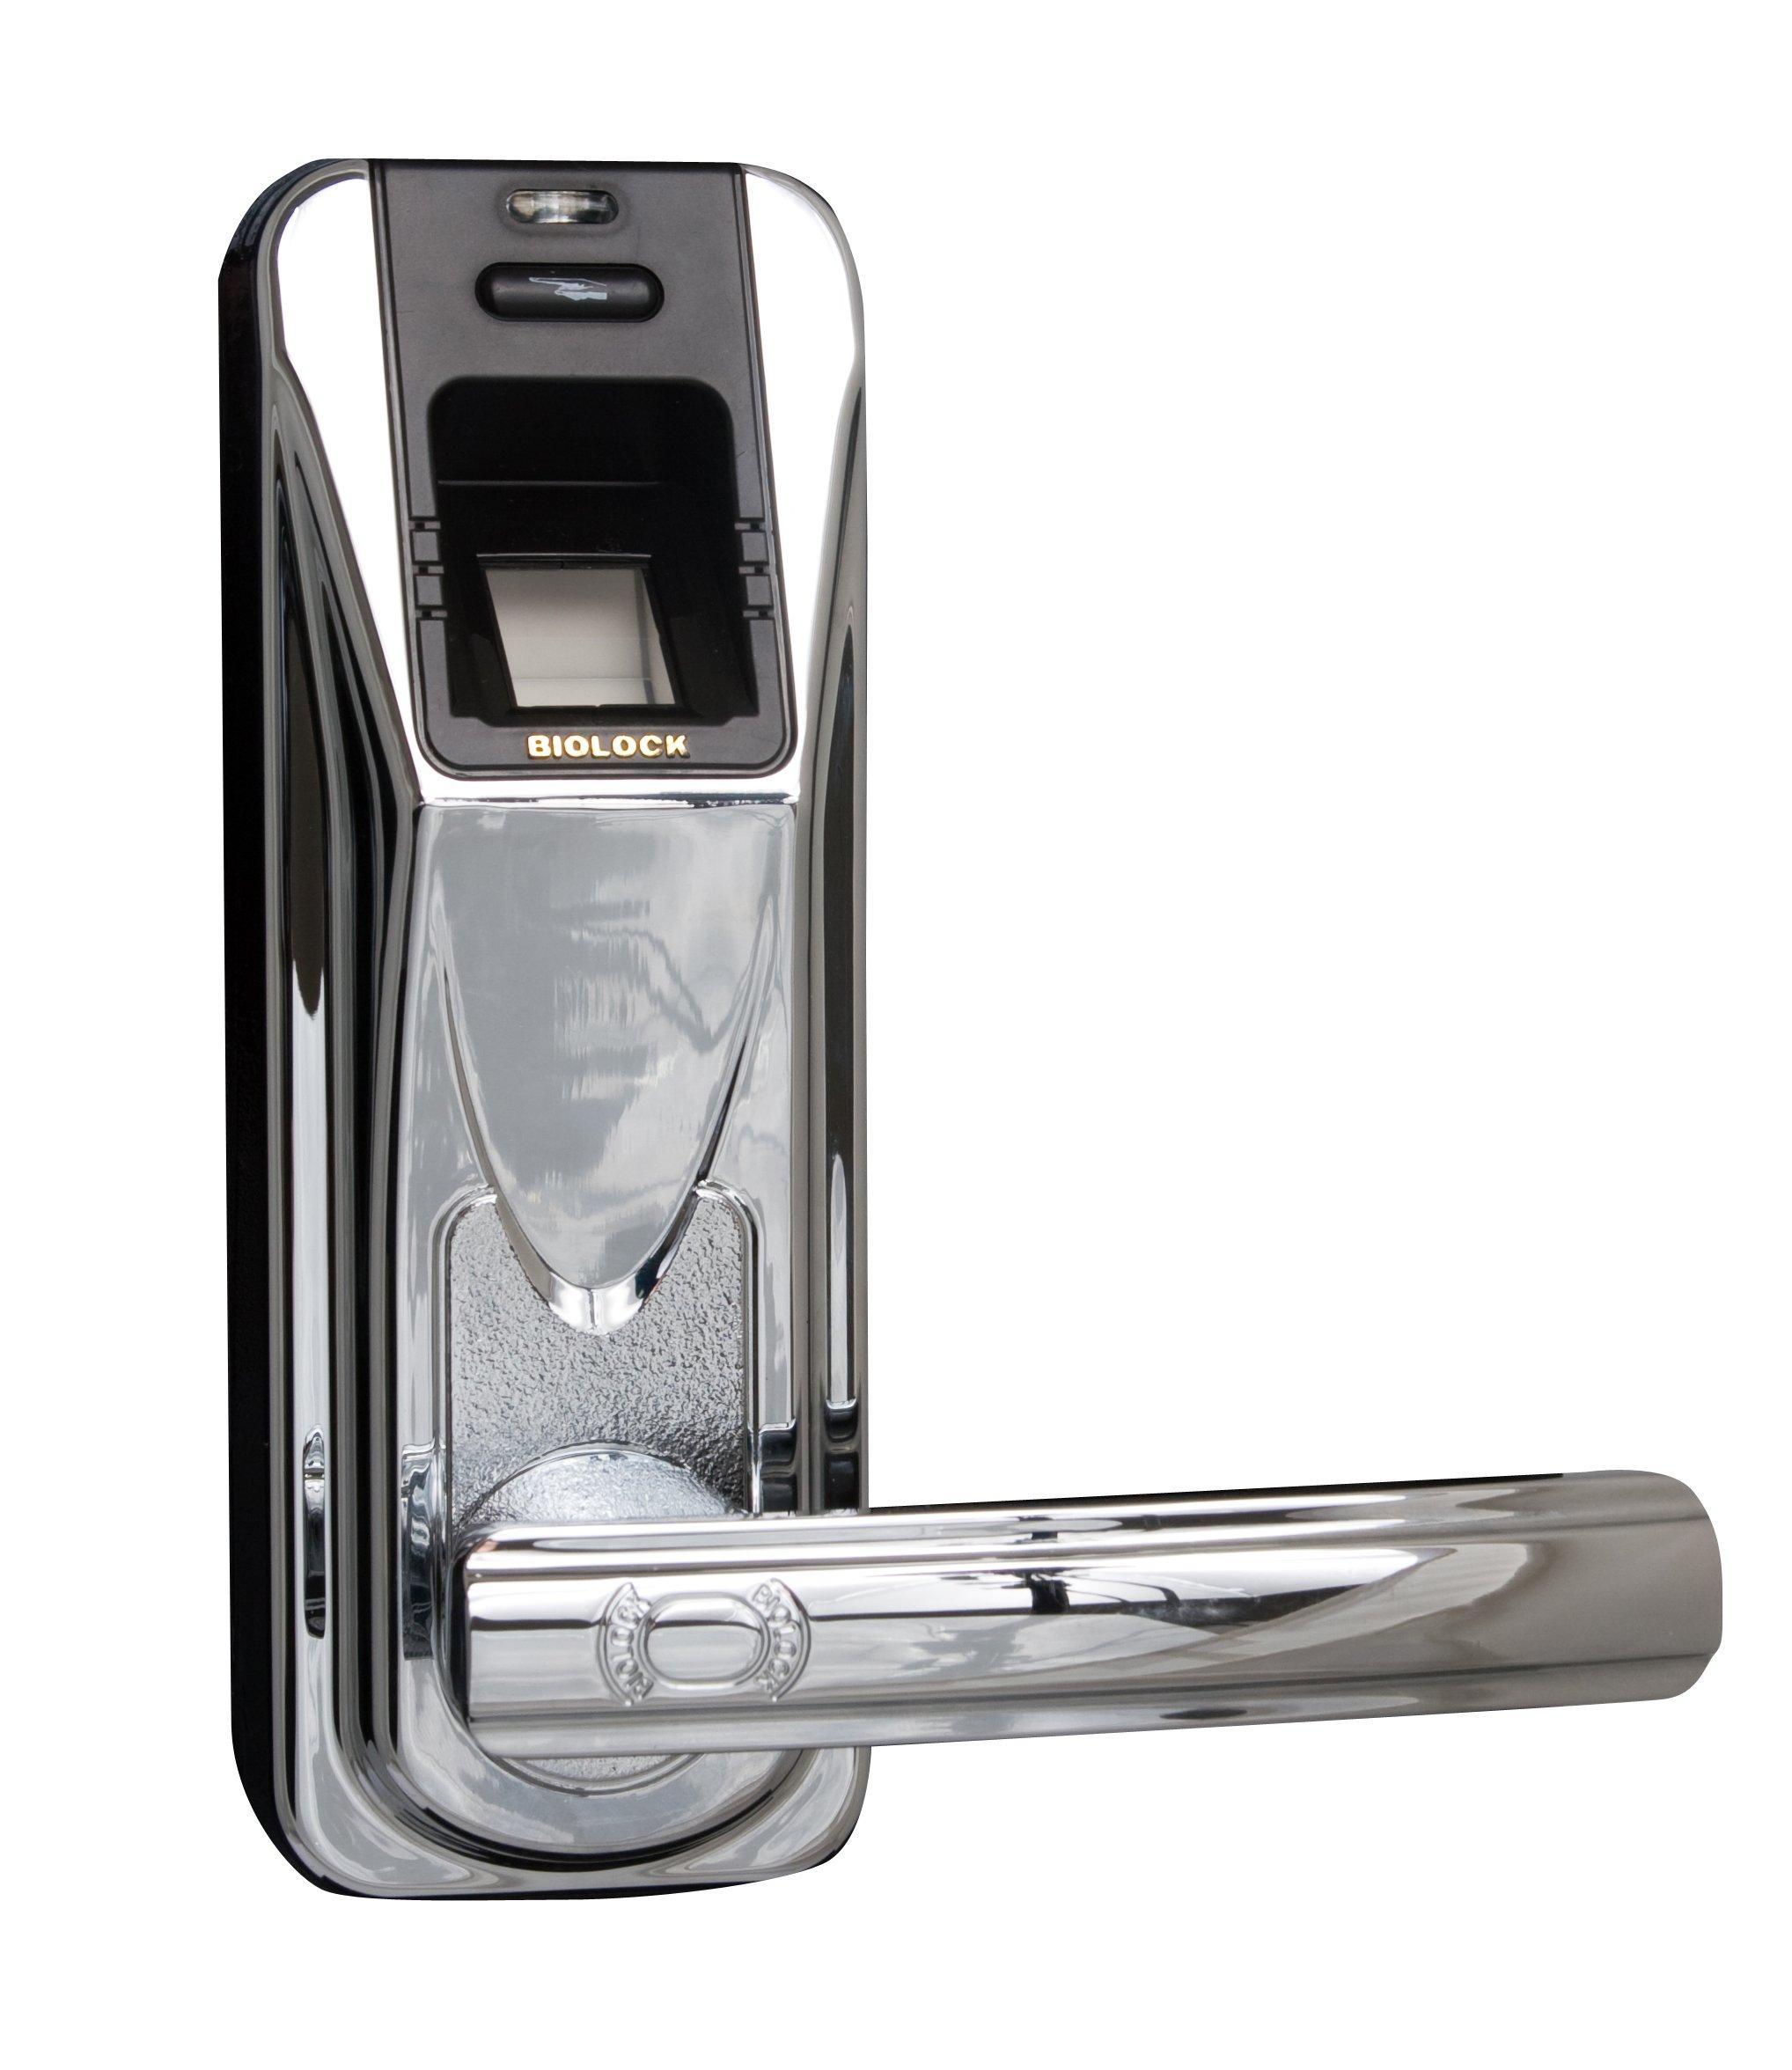 Biolock 426 Biometric Fingerprint Entry Door Lock, Polished Chrome with Black Accent